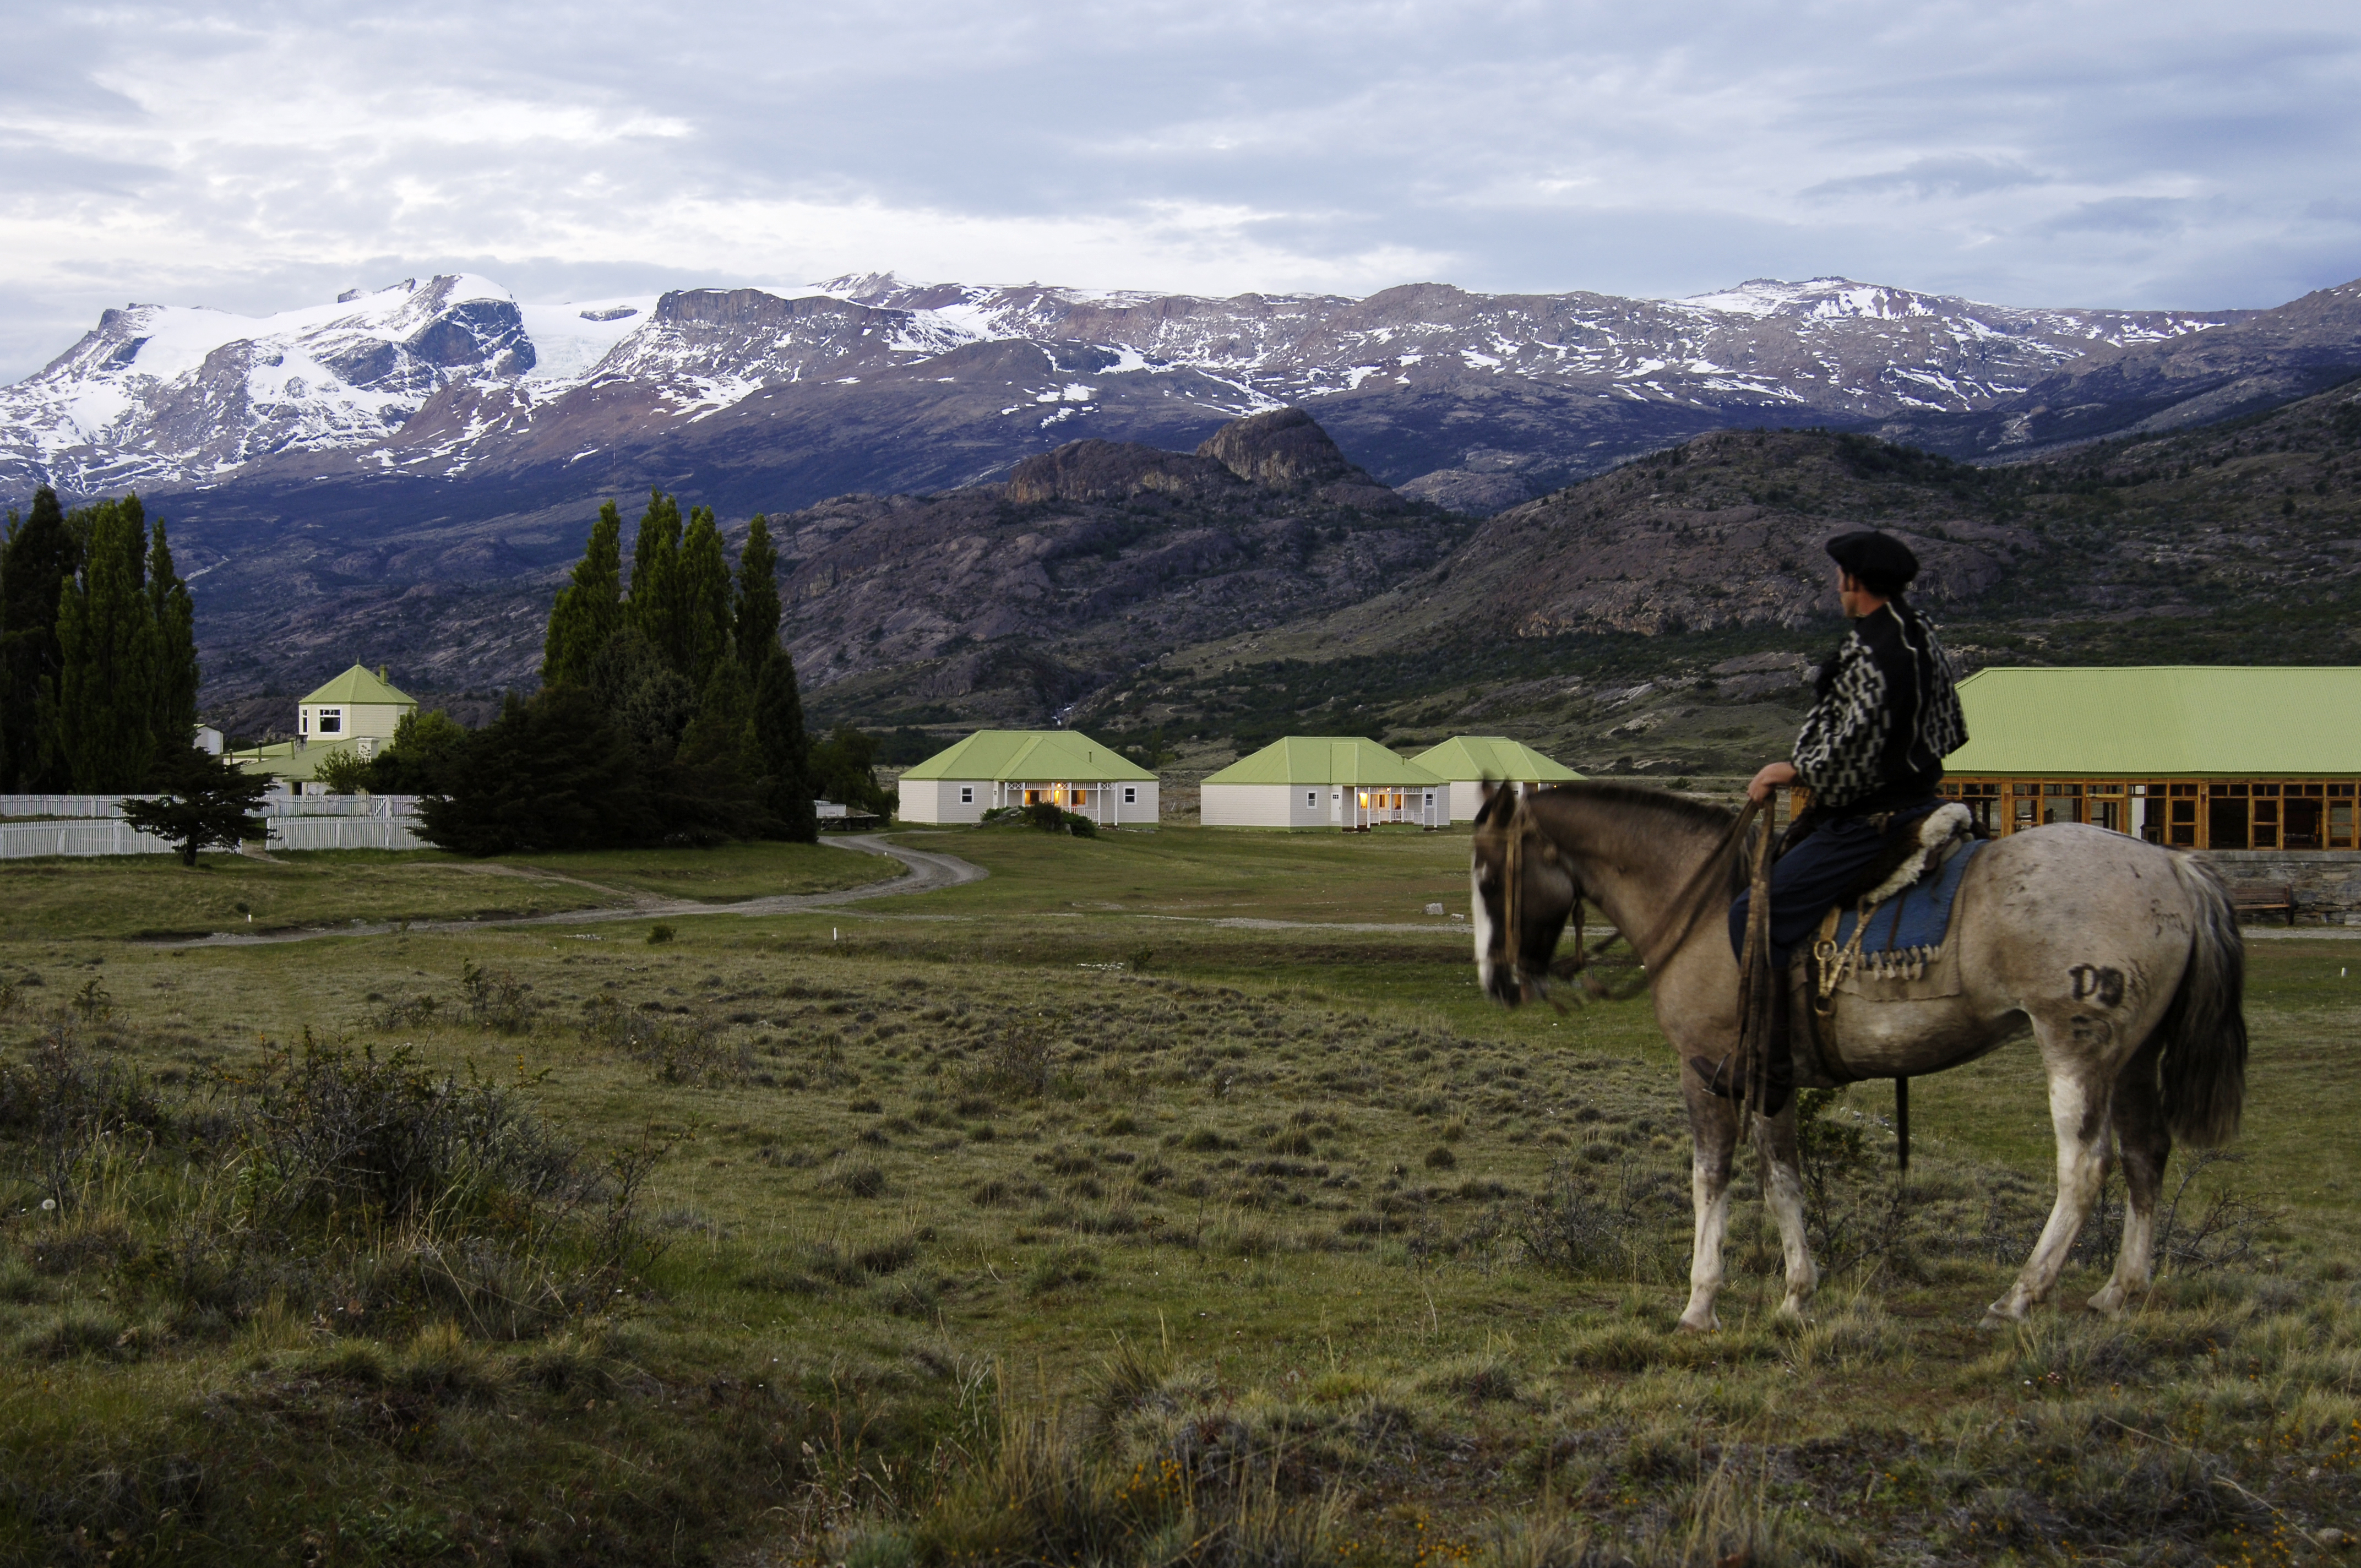 Argentina El Calafate - Estancia Cristina Patagonia